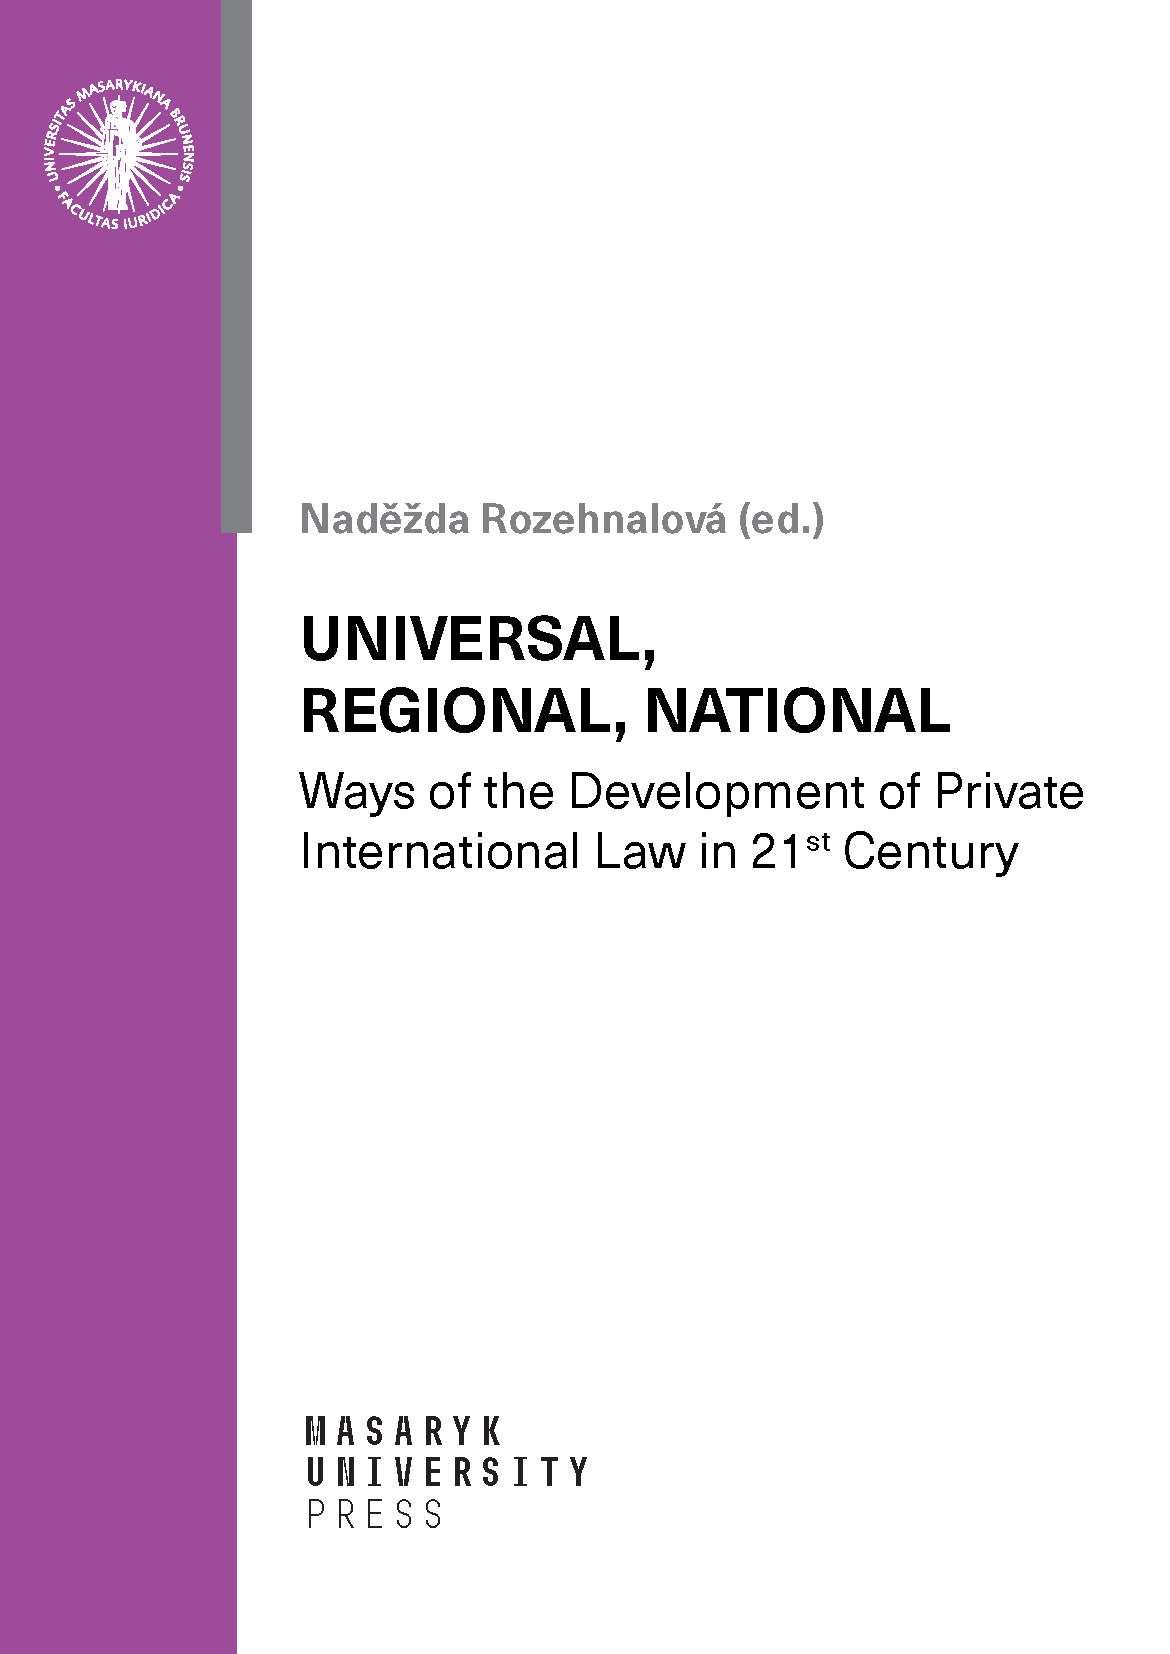 Obálka pro Universal, Regional, National – Ways of the Development of Private International Law in 21st Century